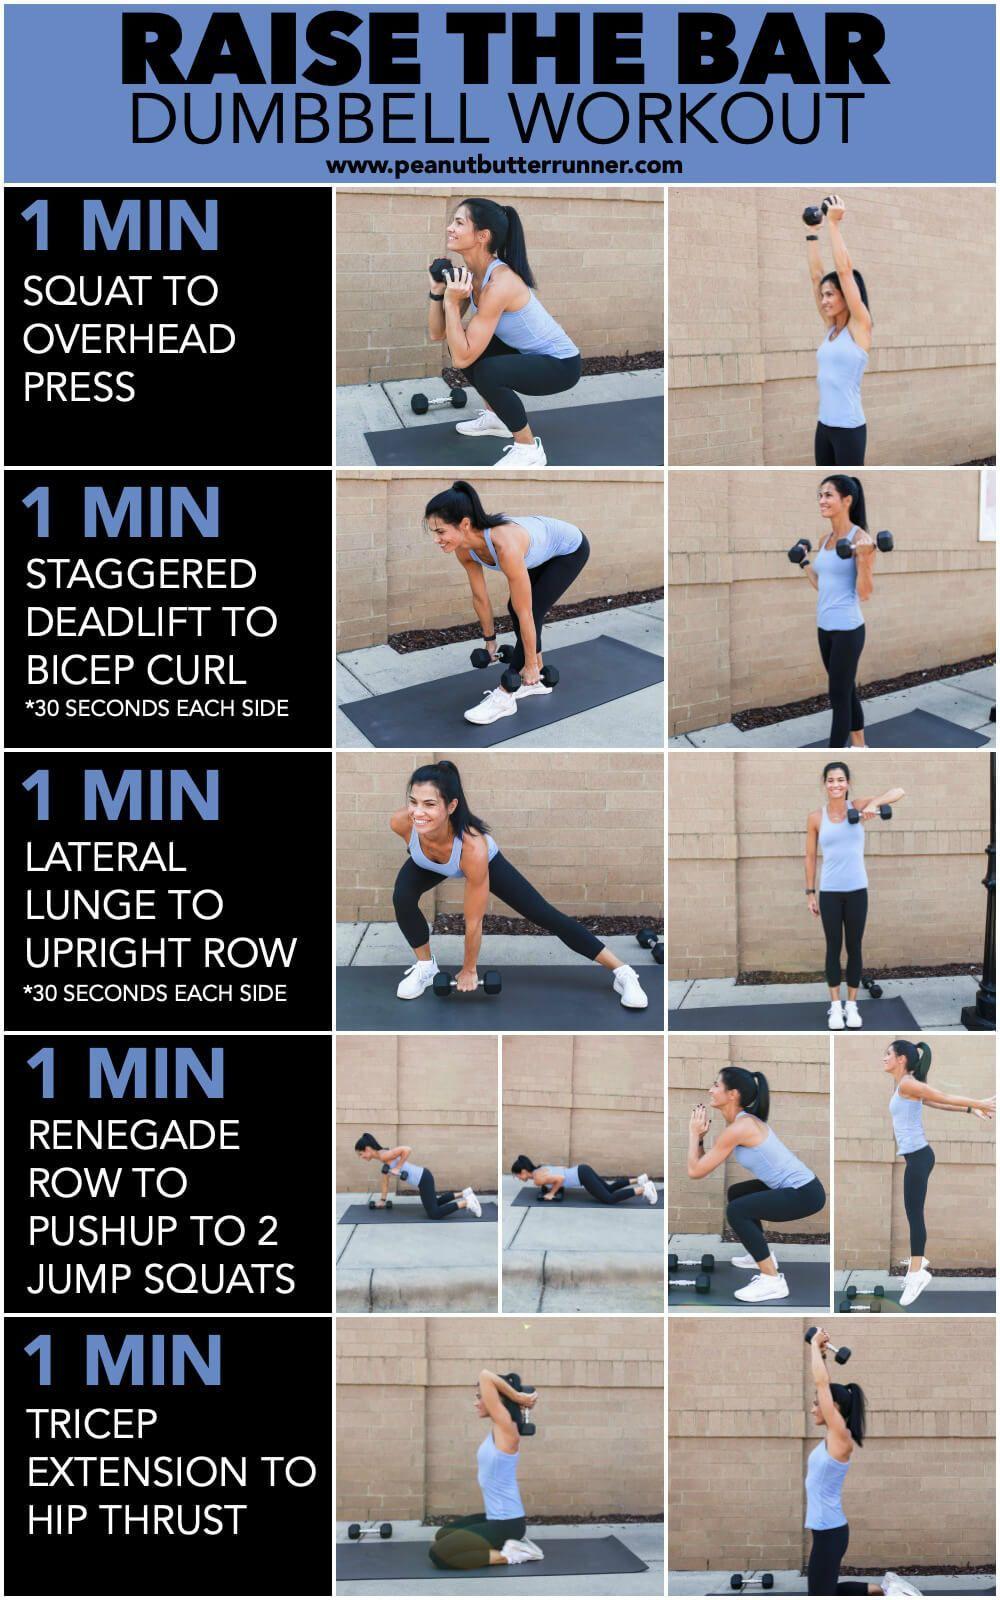 Raise The Bar Dumbbell Workout Dumbbellworkout Dumbbell Workout Workout Dumbbell Workout At Home